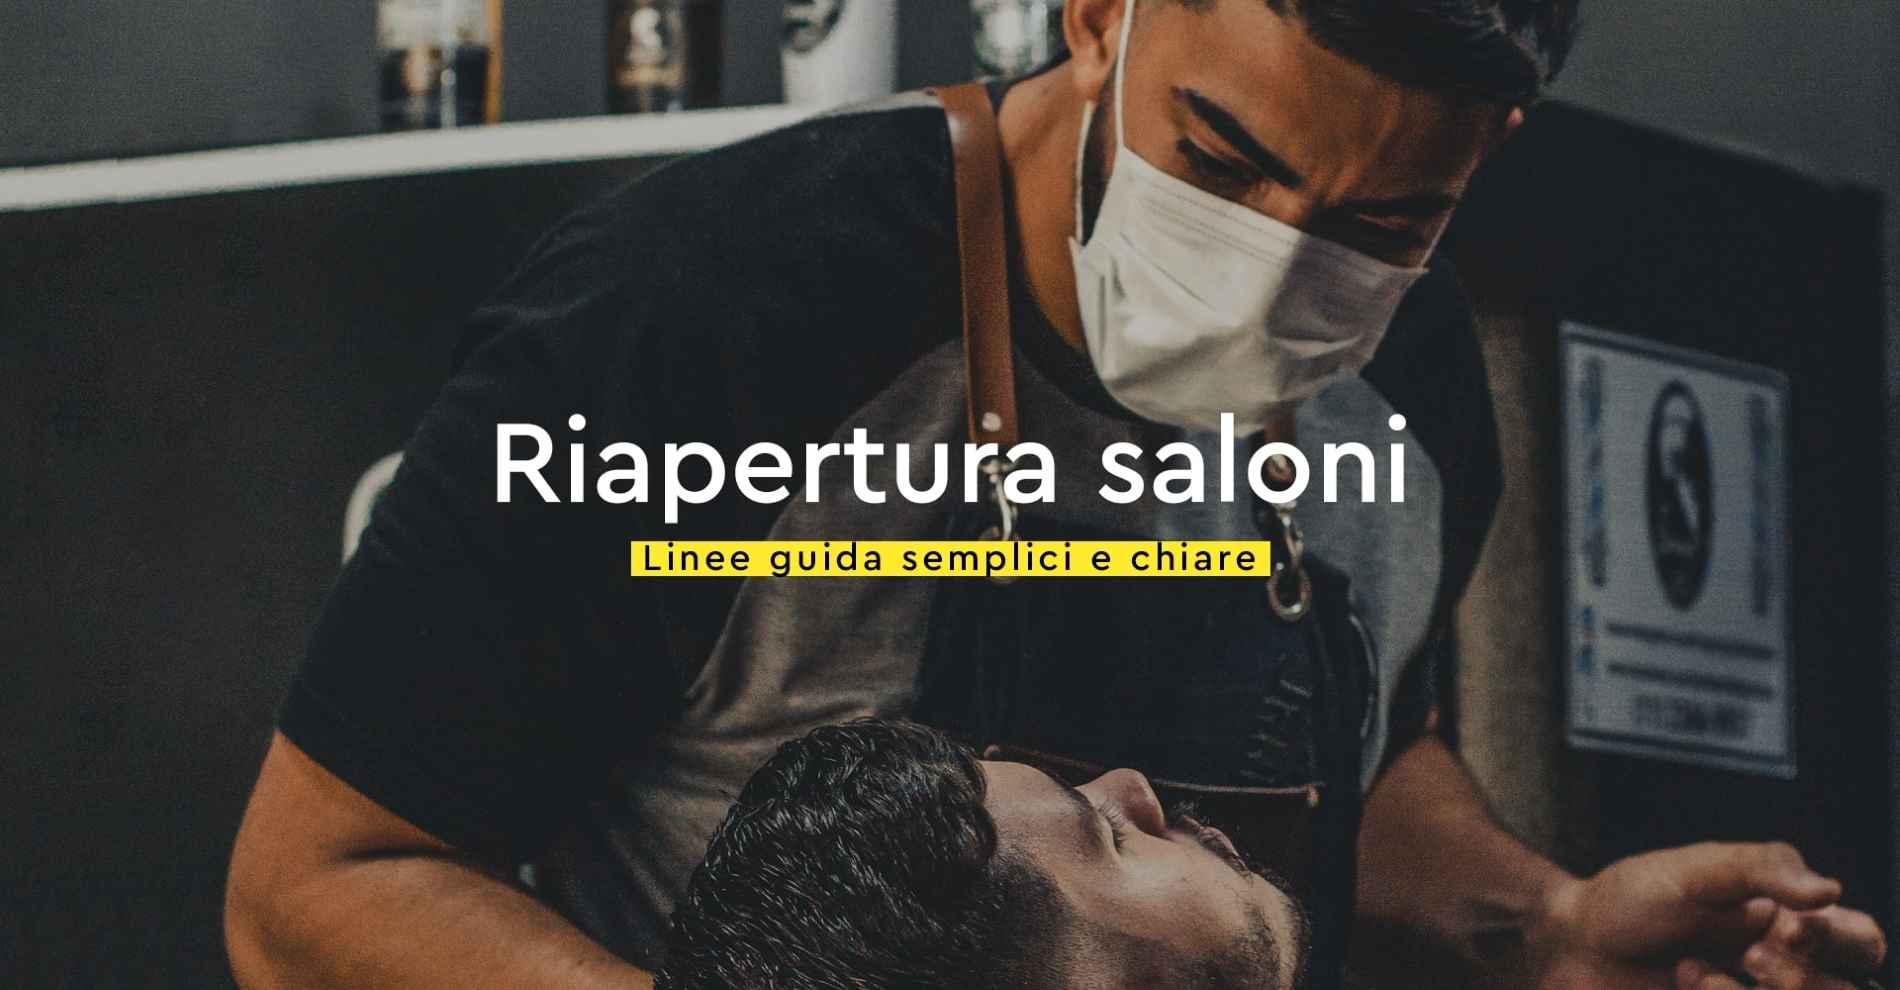 Immagine copertina riapertura saloni di parrucchieri e centri estetici